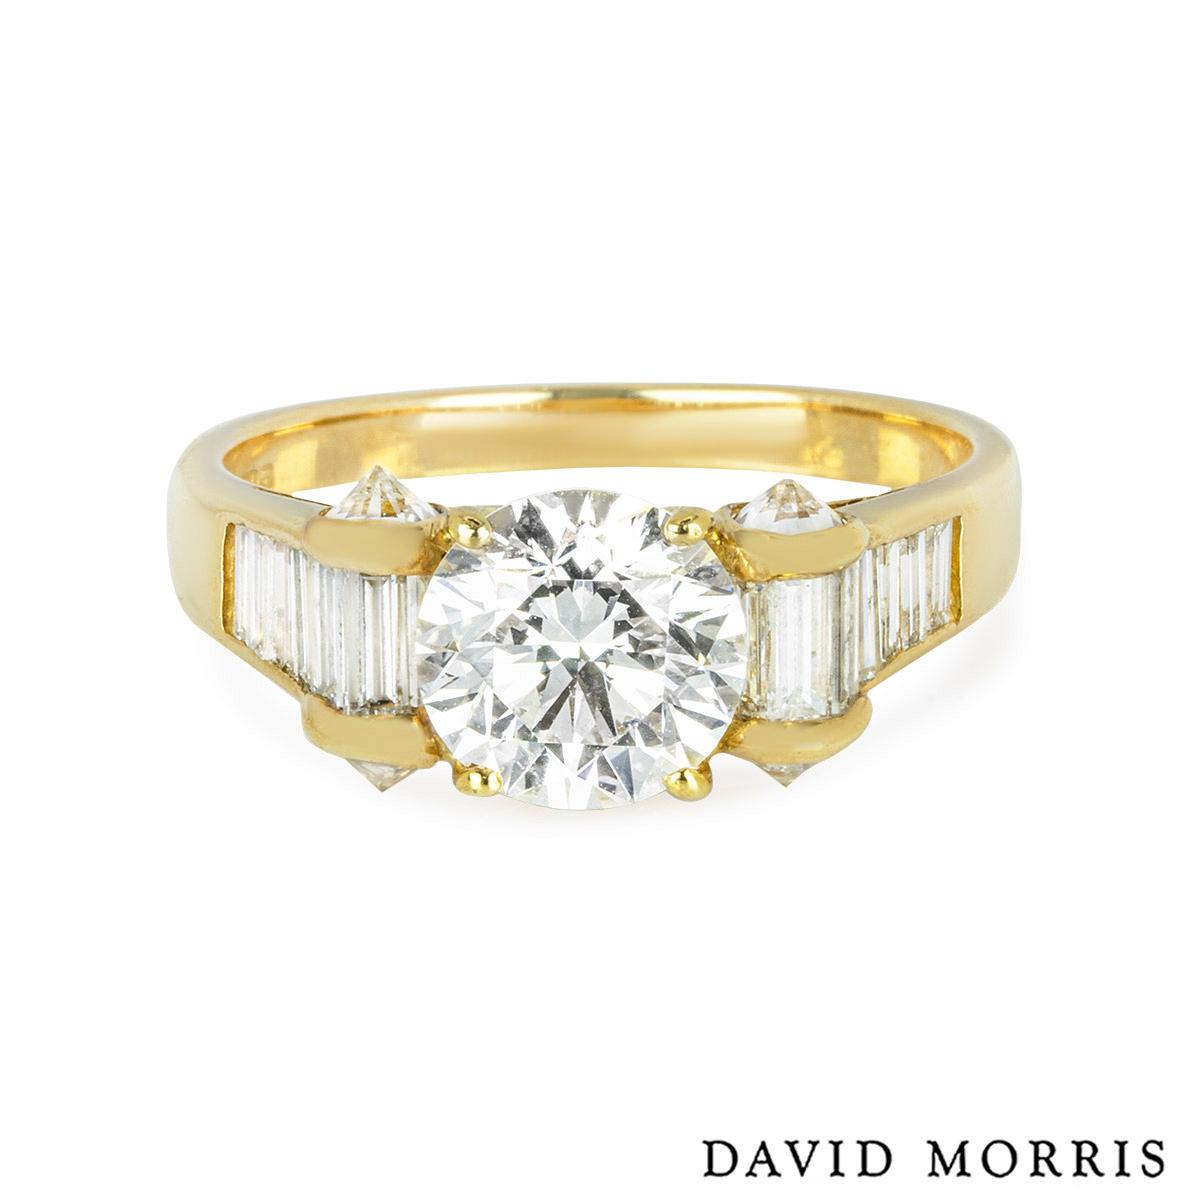 David Morris Yellow Gold Diamond Ring 1.40ct H/VS1